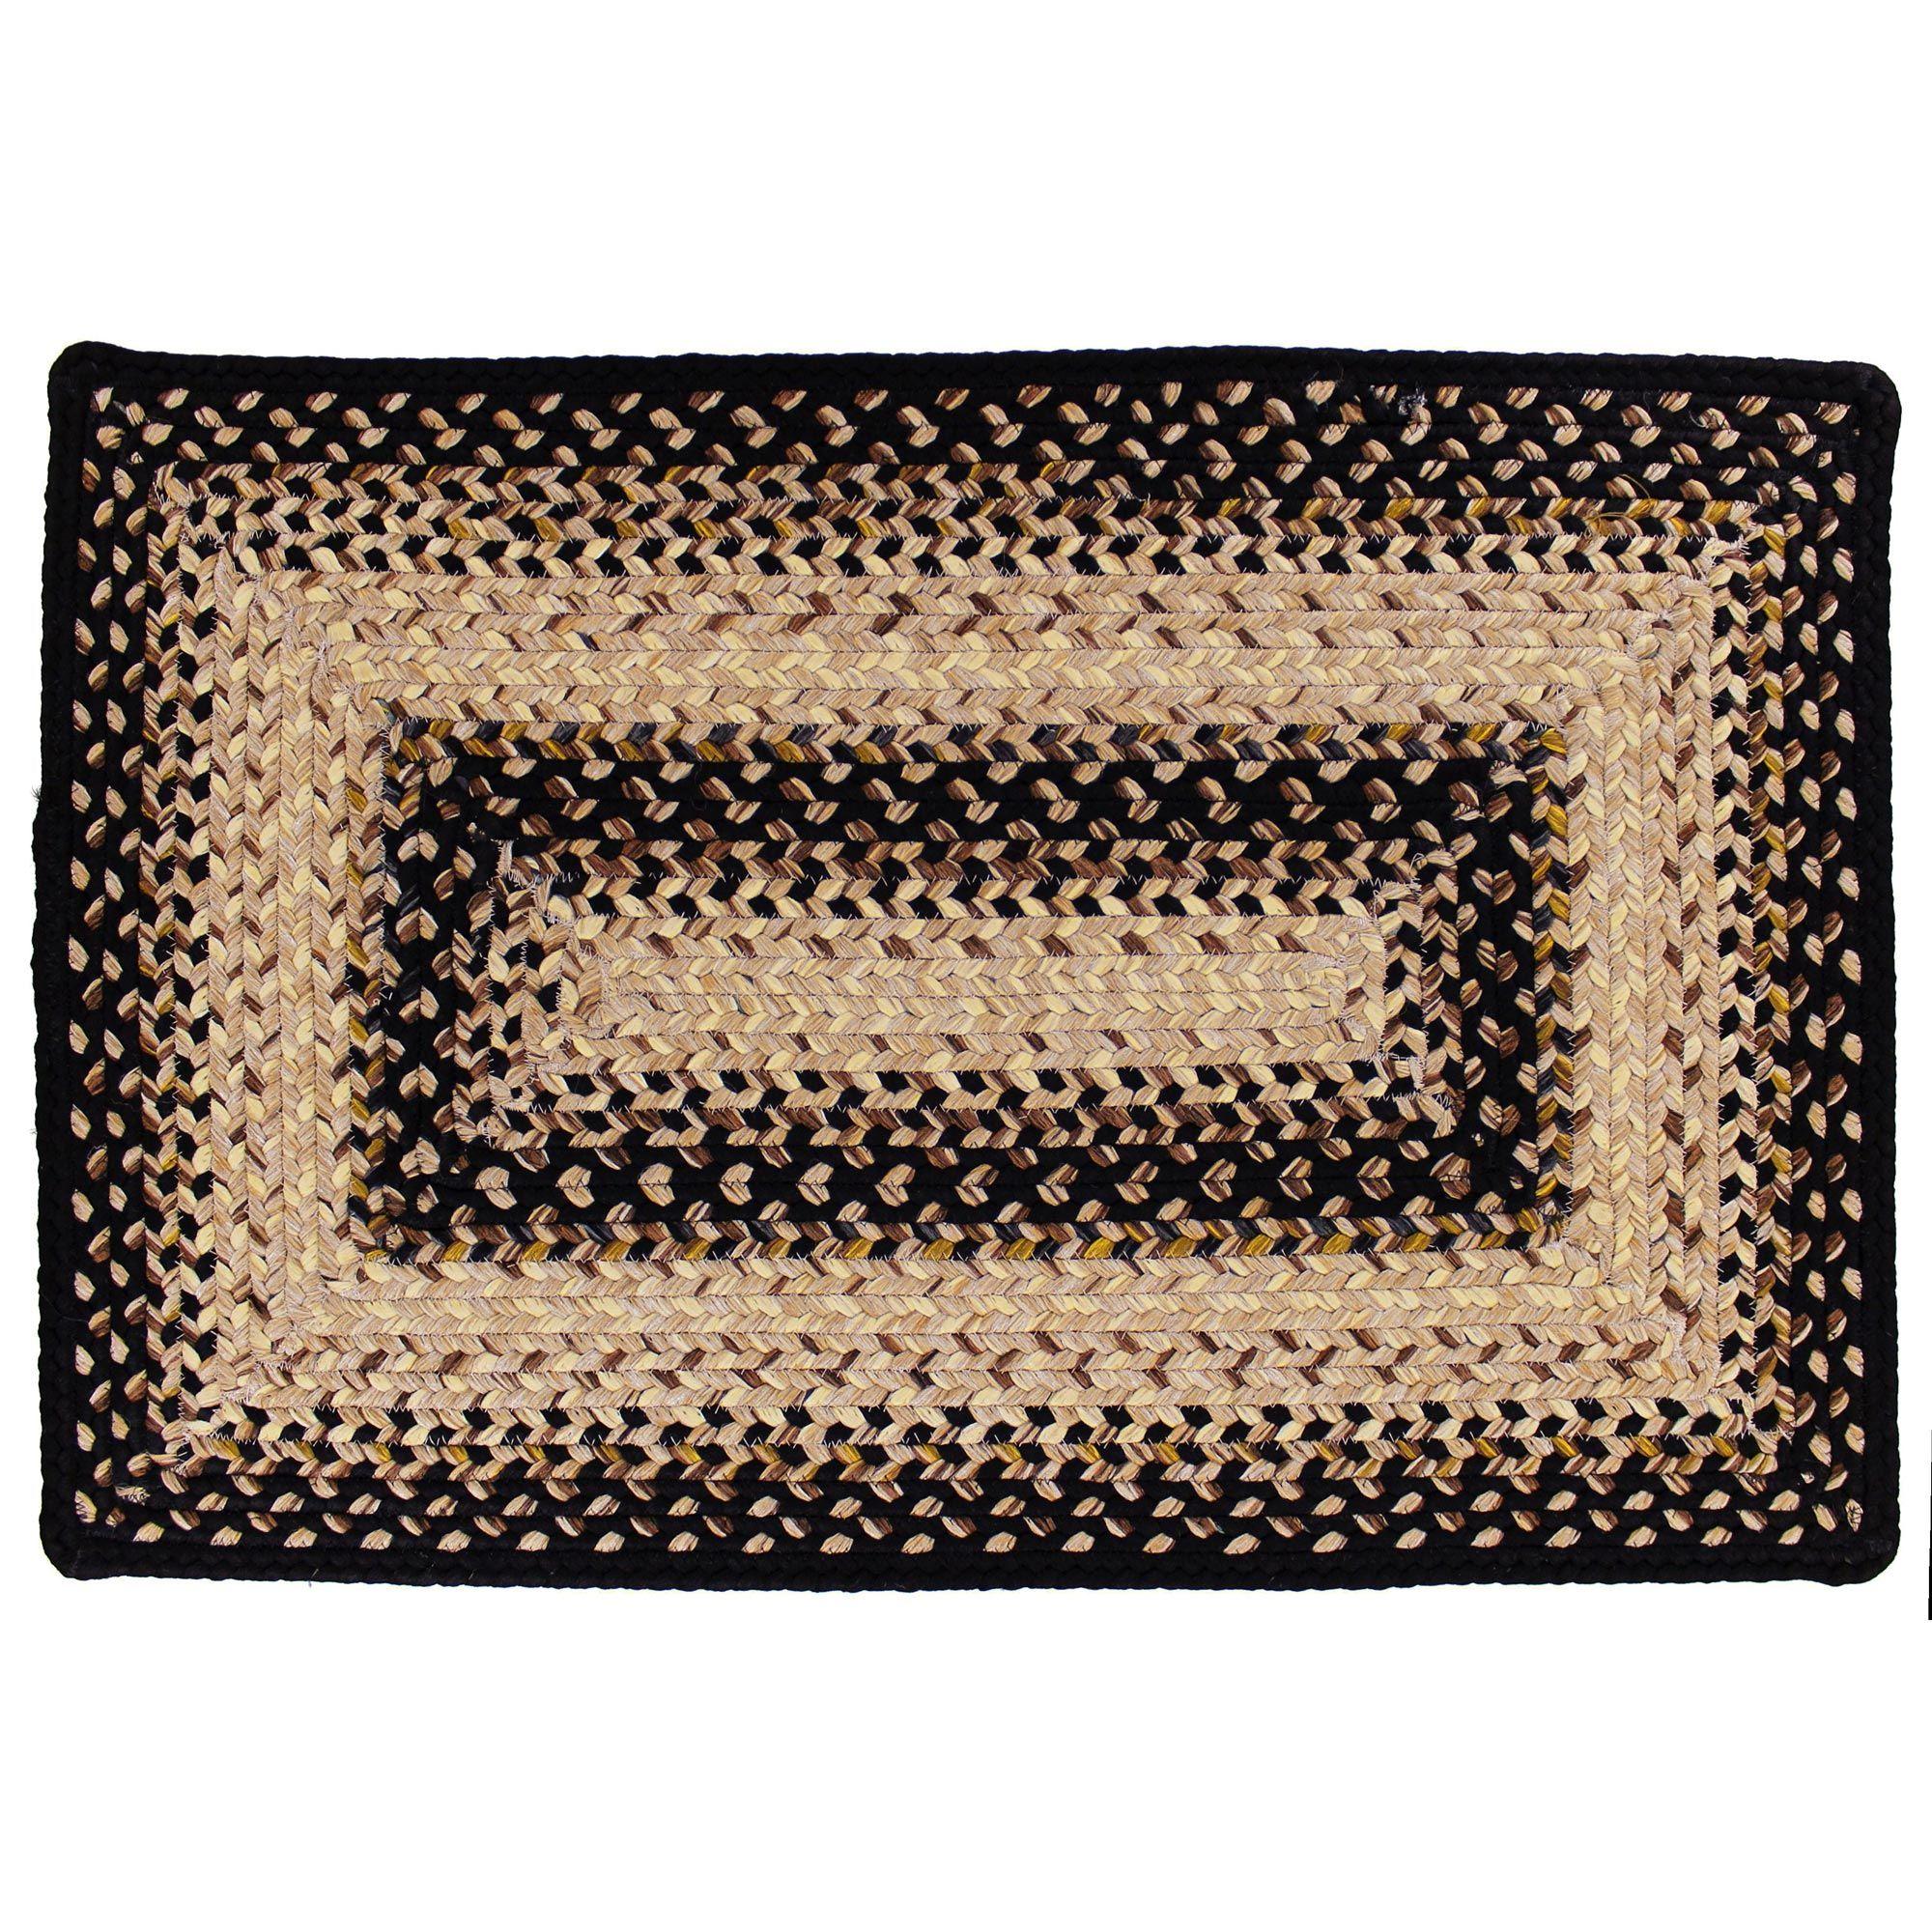 Black mist rectangle ultra durable braided rug 5x8